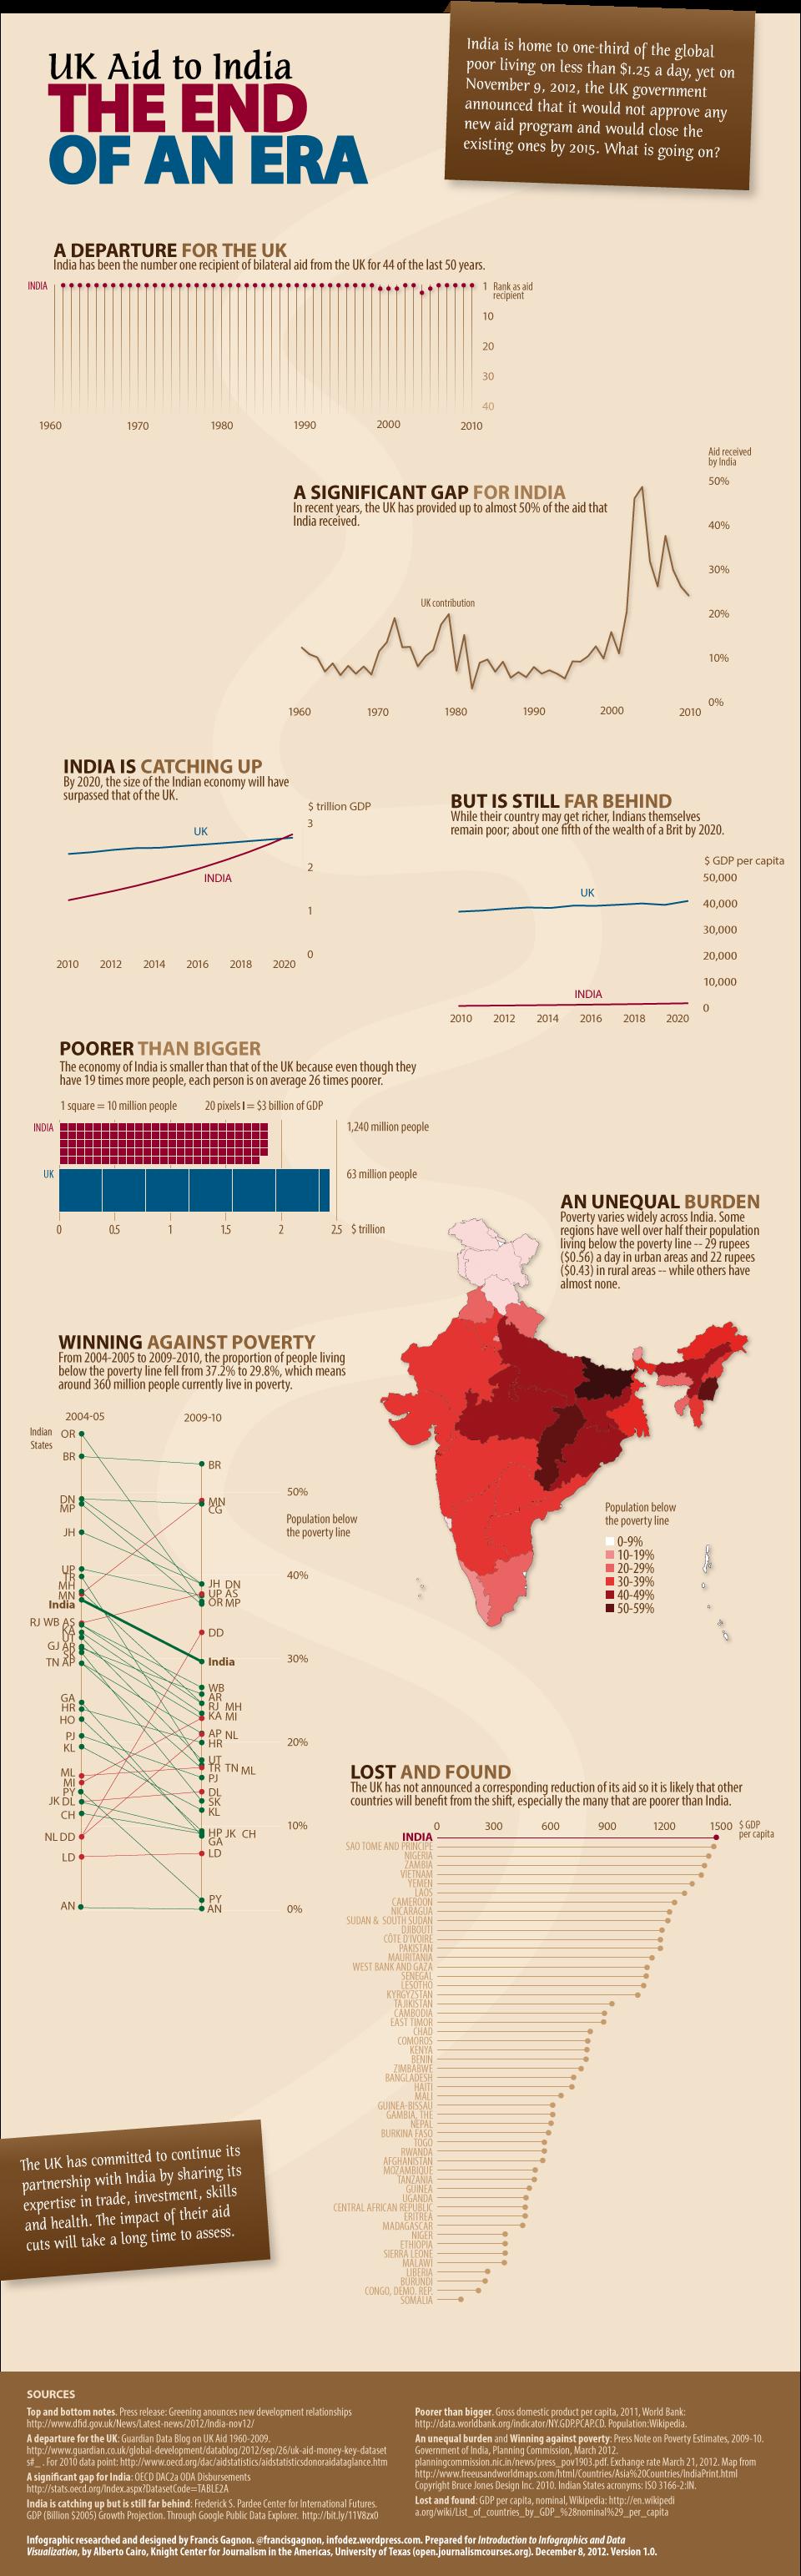 UK Aid to India. Francis Gagnon